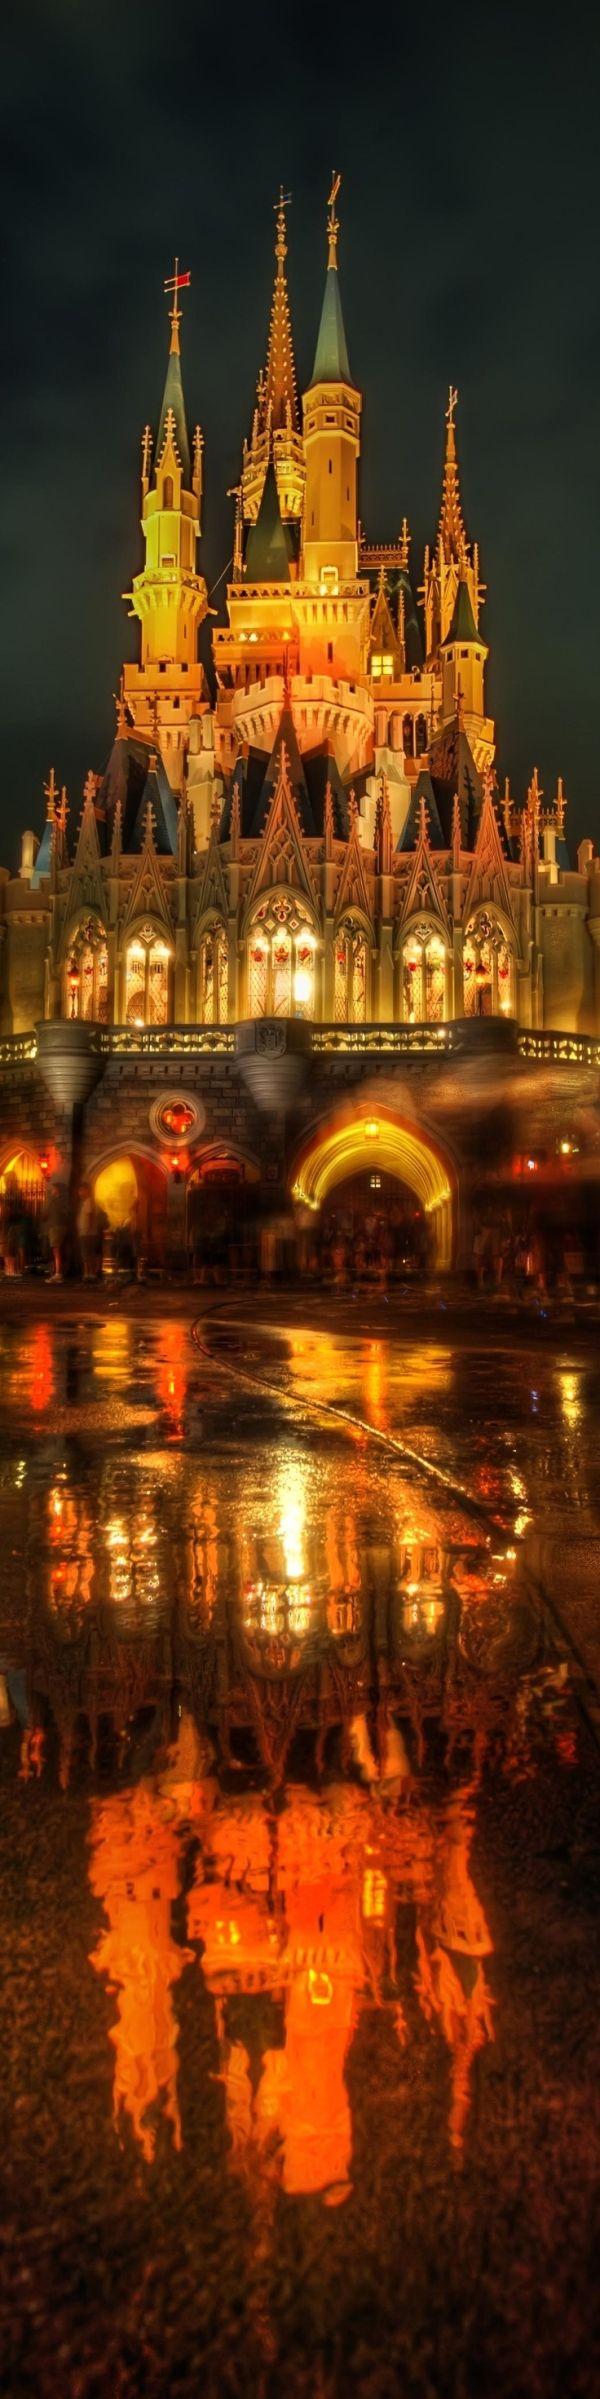 Cinderella Castle reflection at Walt Disney World Resort in Orlando, Florida.